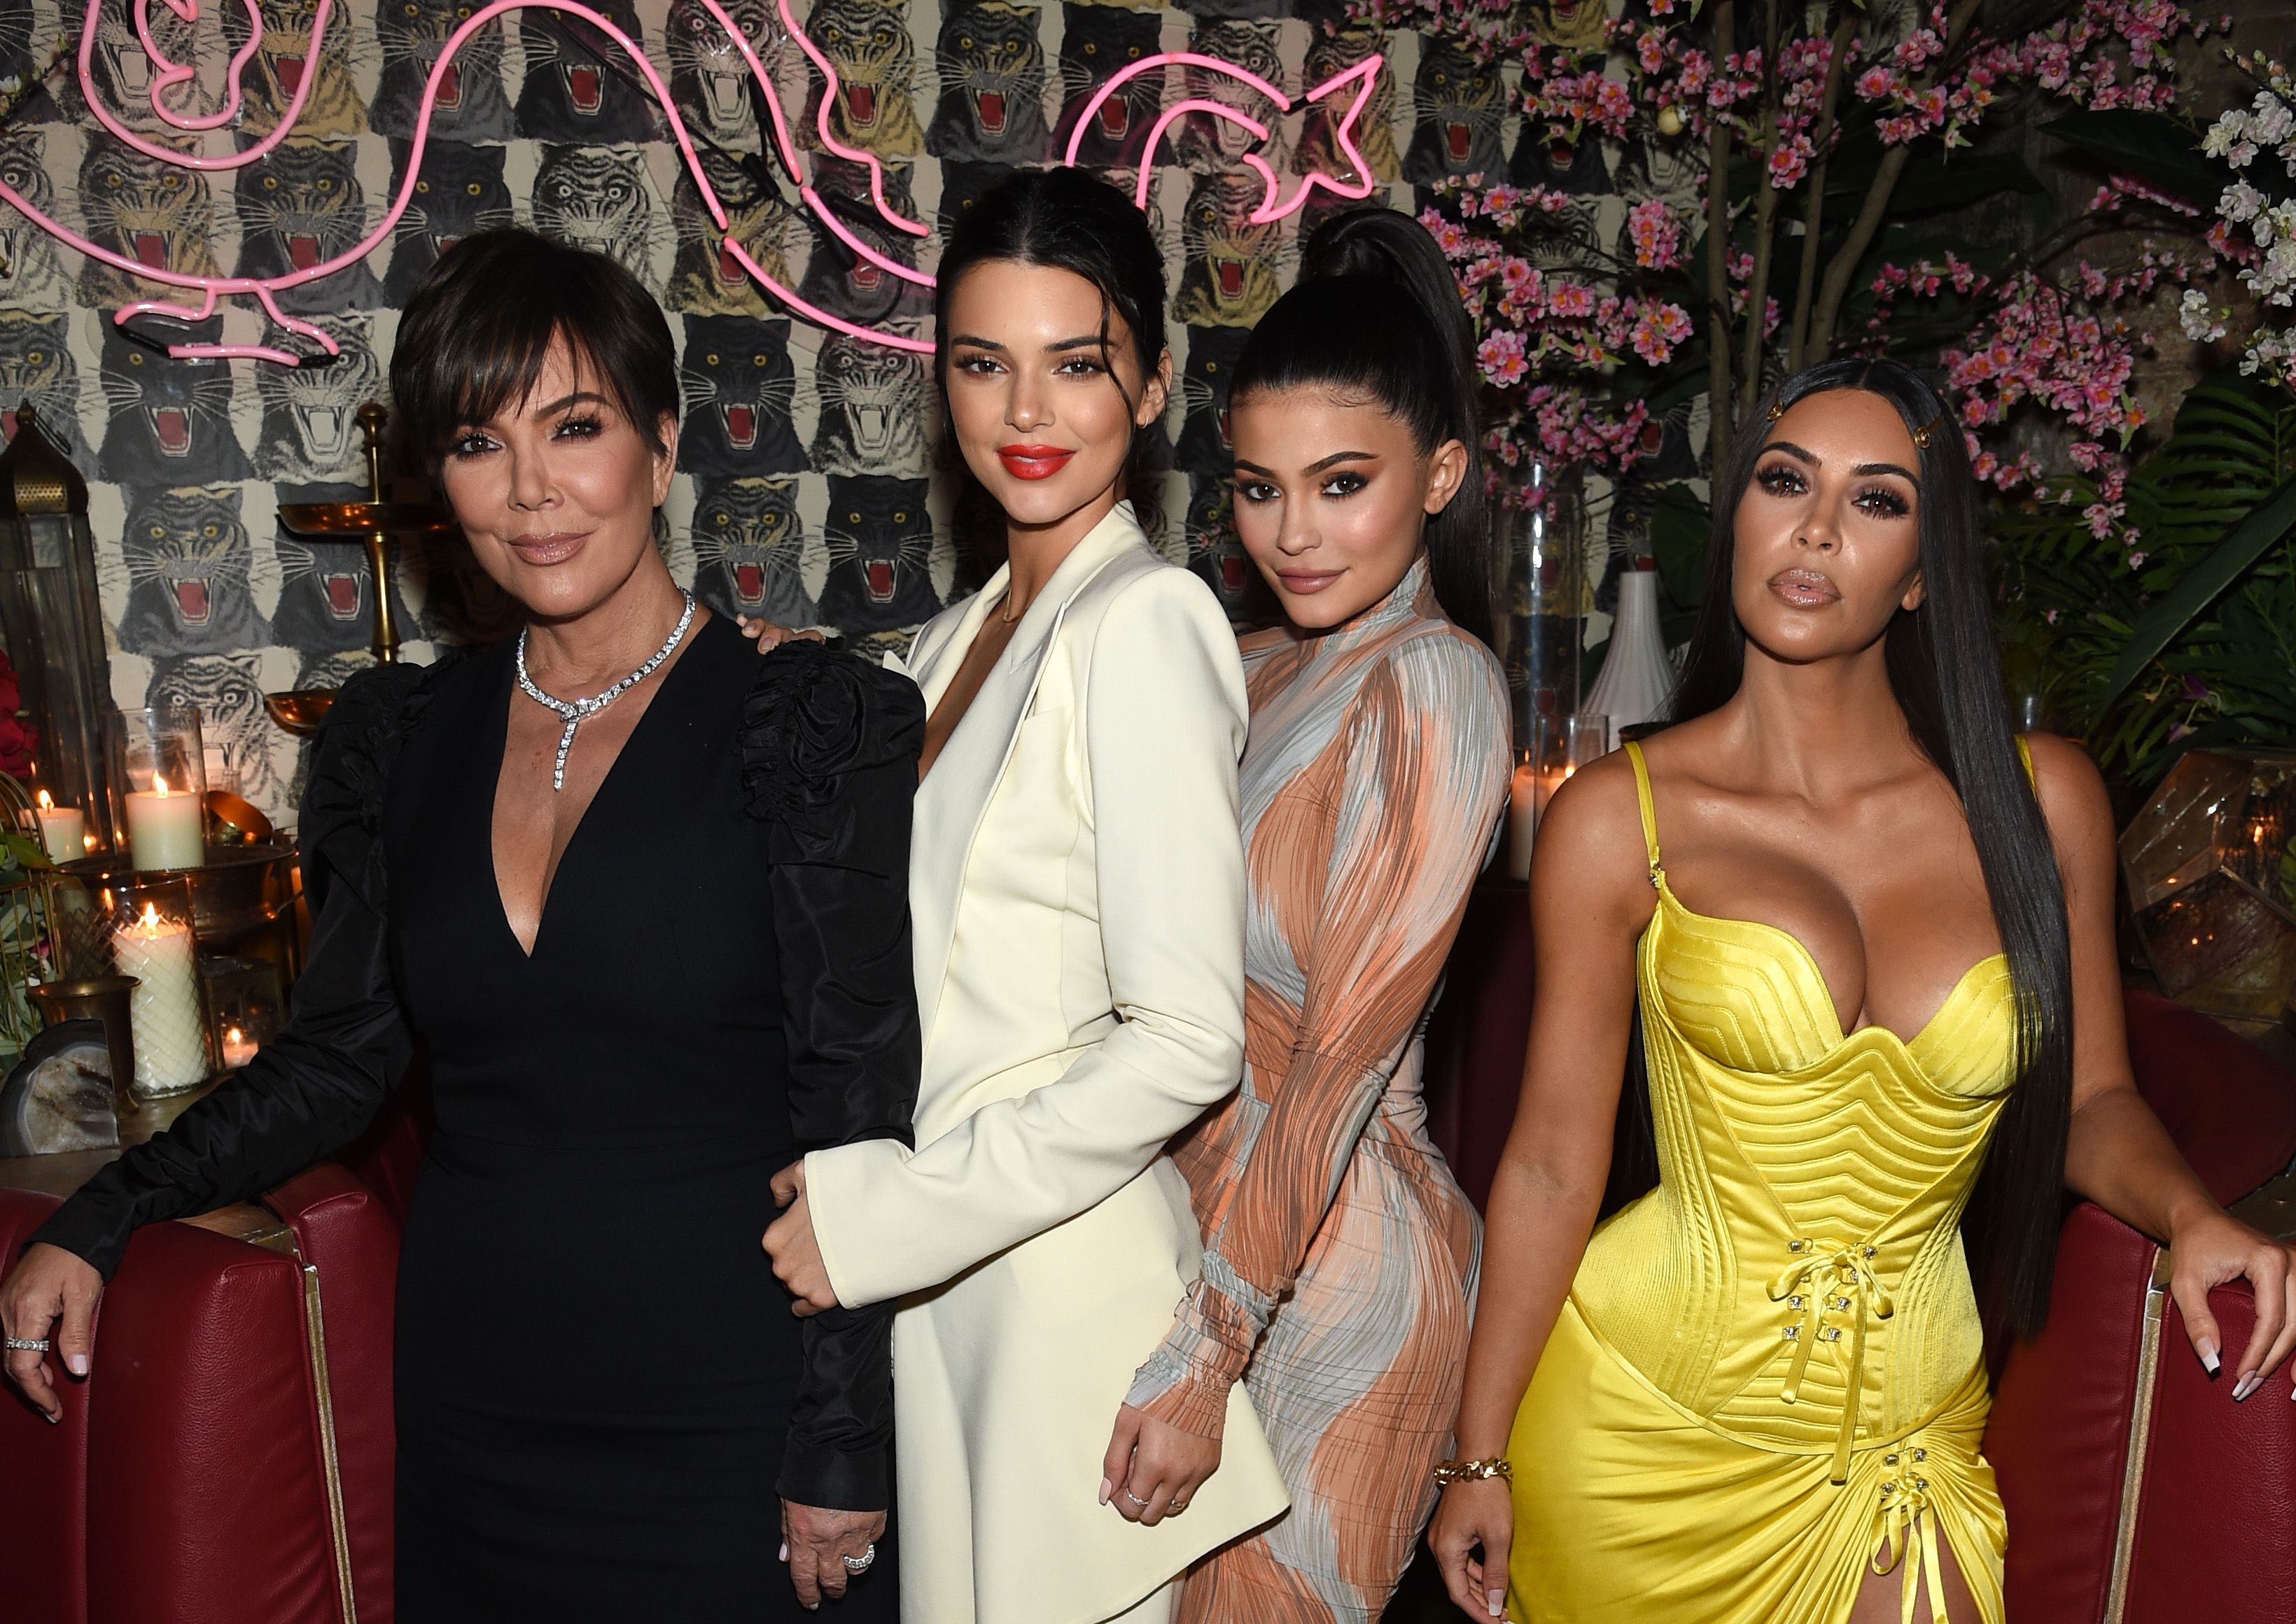 The Kardashian/Jenners